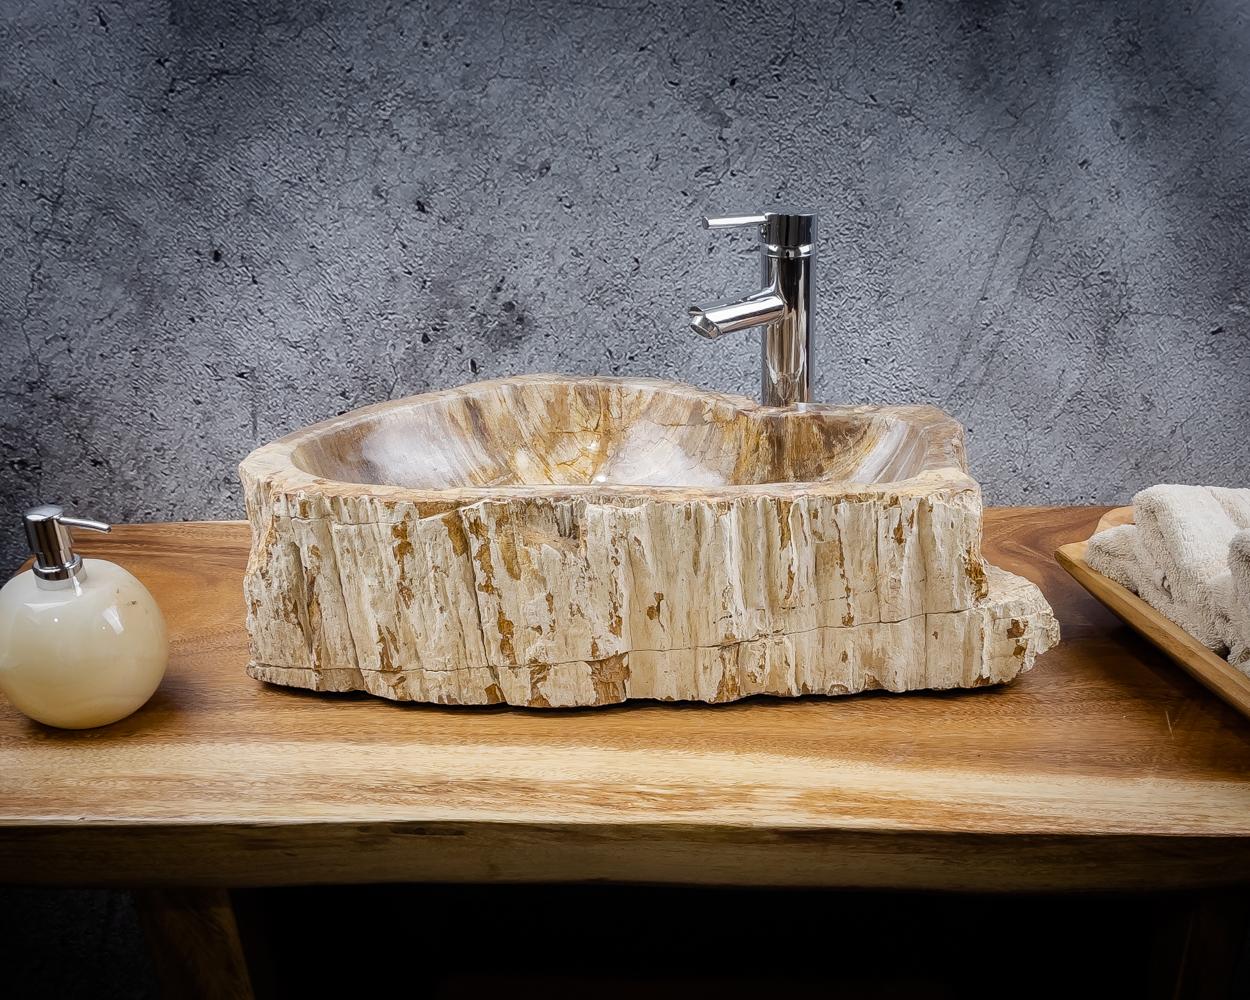 Lavabo grande de madera natural petrificada (fosilizada) de 50x37x15cm